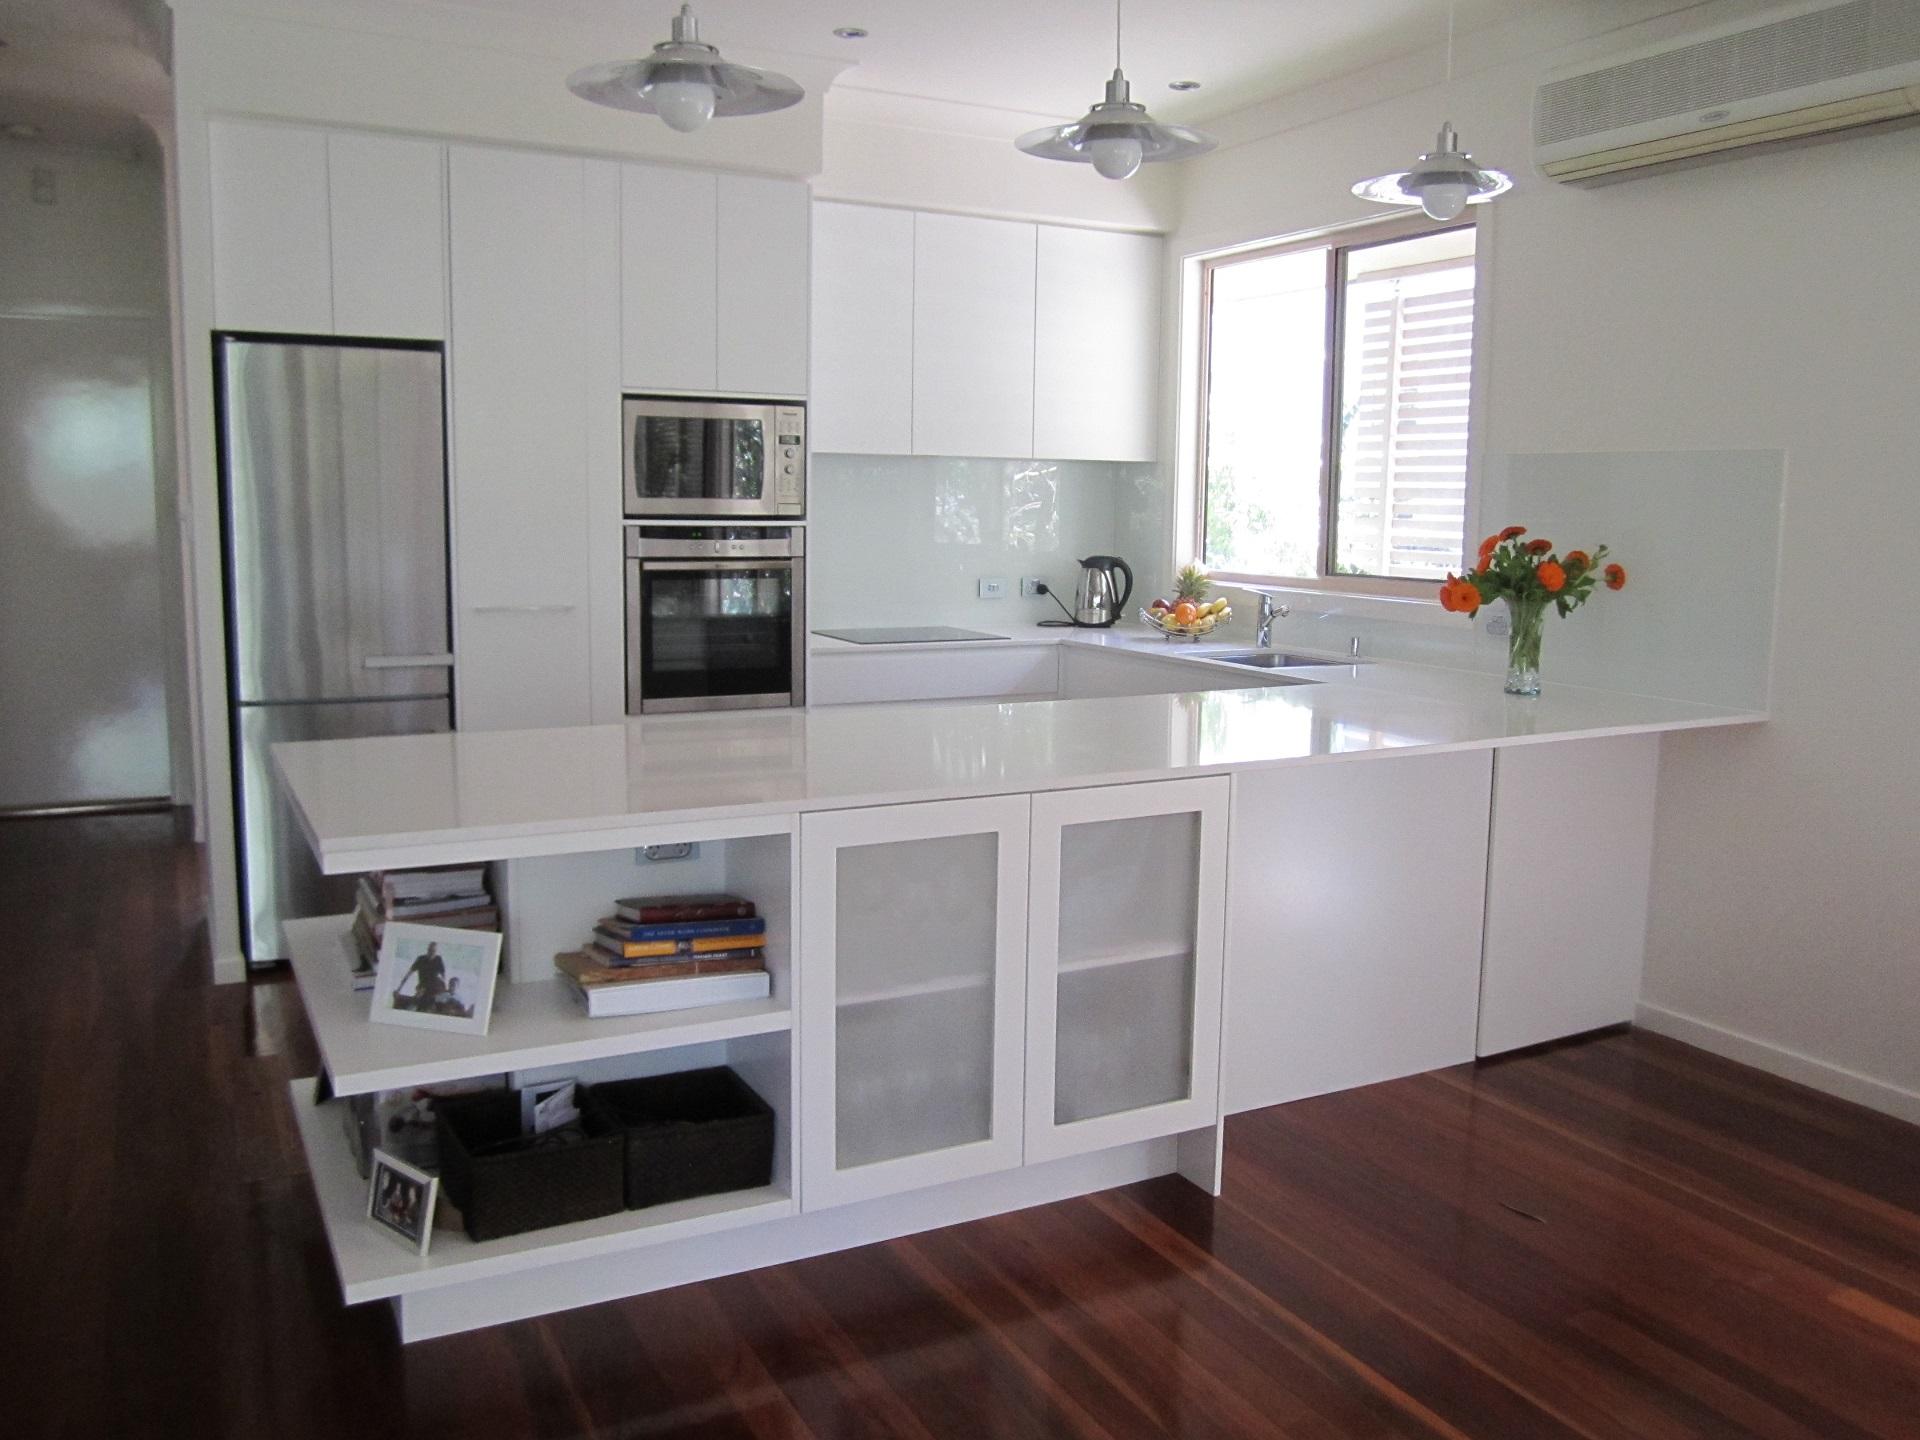 brisbane-kitchen-design-the-grange-contemporary-kitchen-renovation1